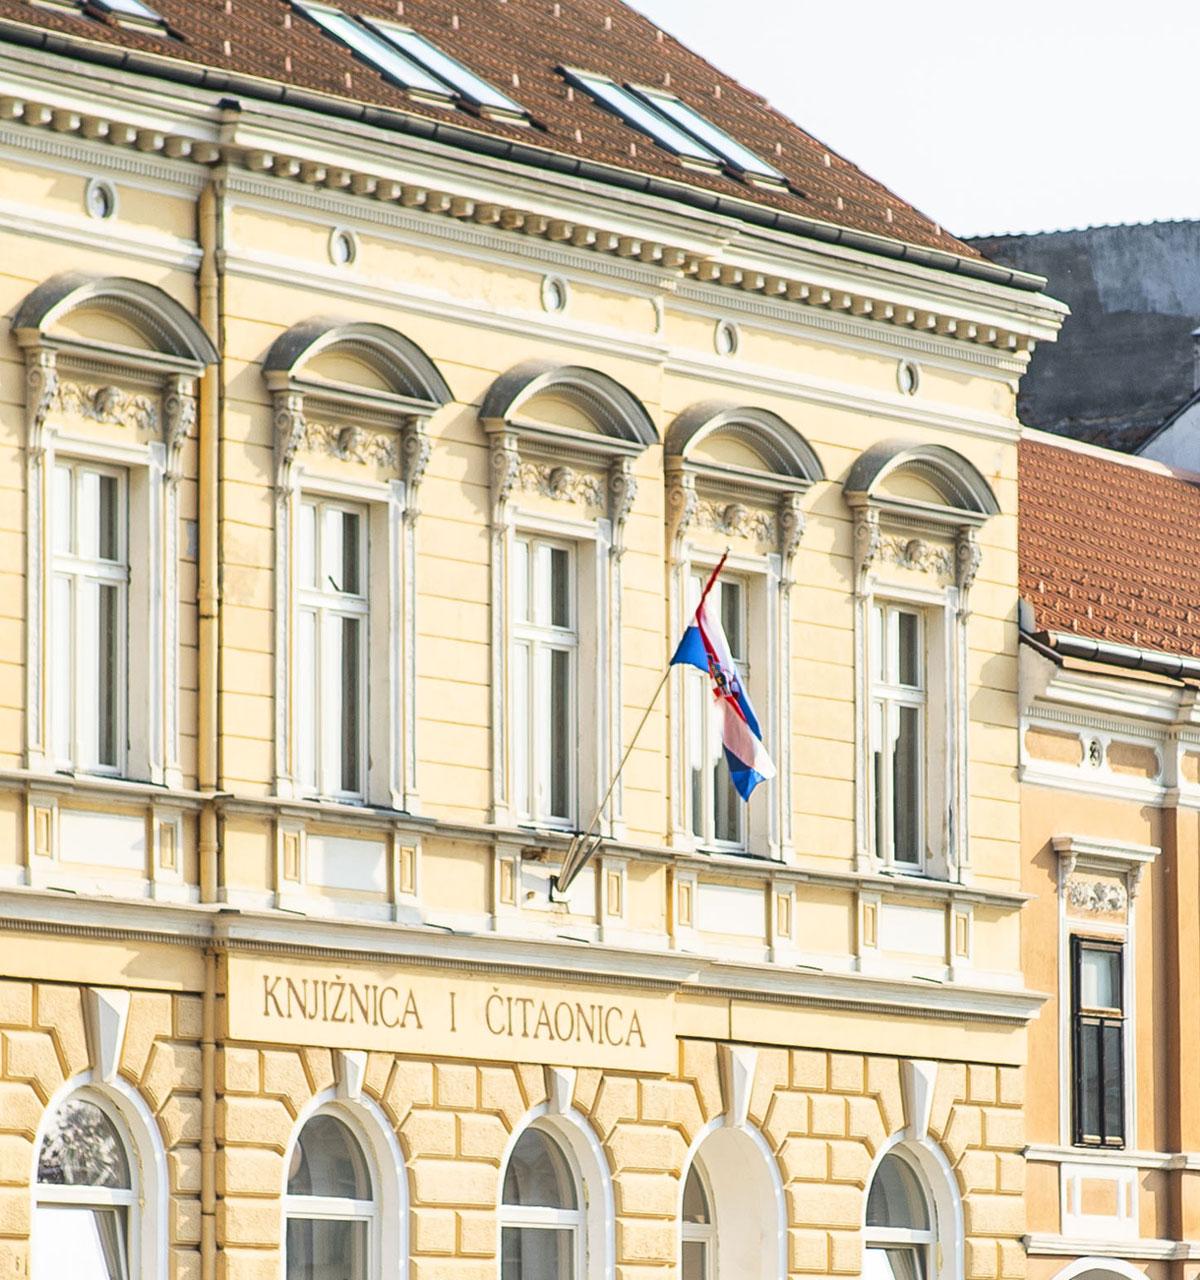 Knjižnica Fran Galović - pročelje zgrade